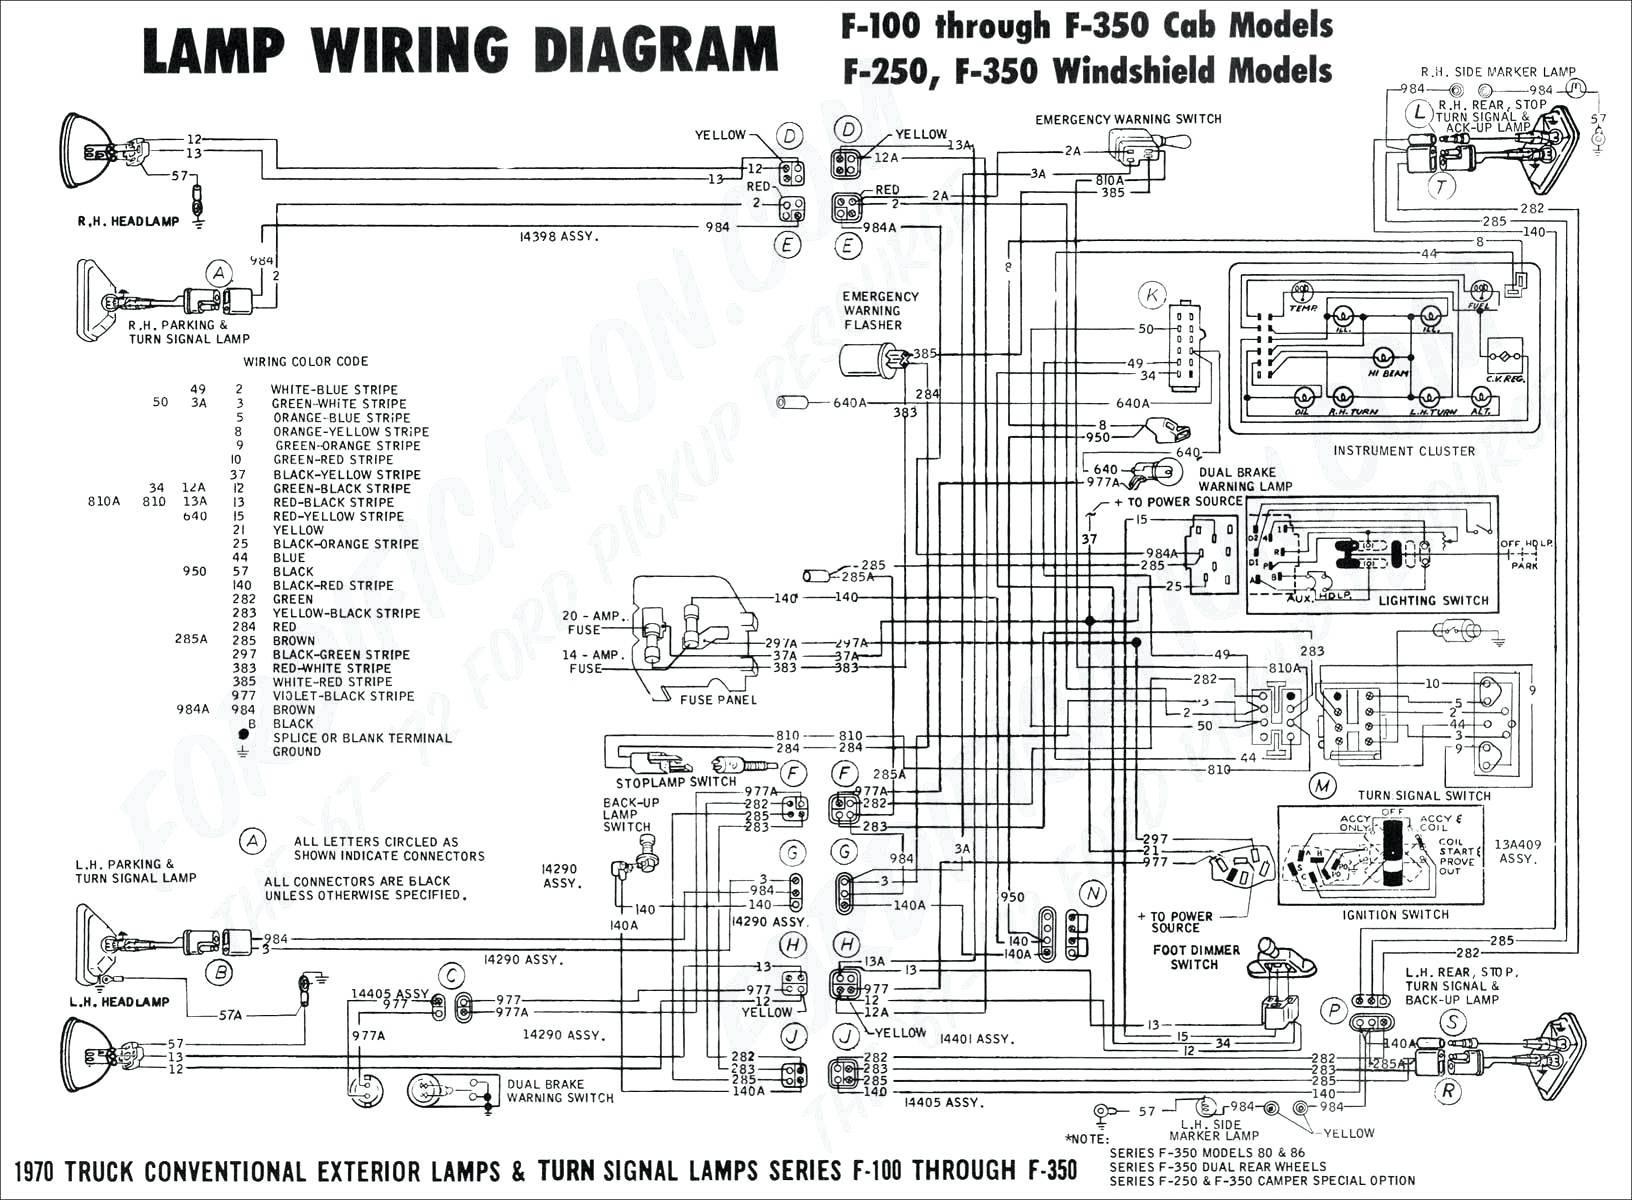 1995 chevy 1500 wiring diagram